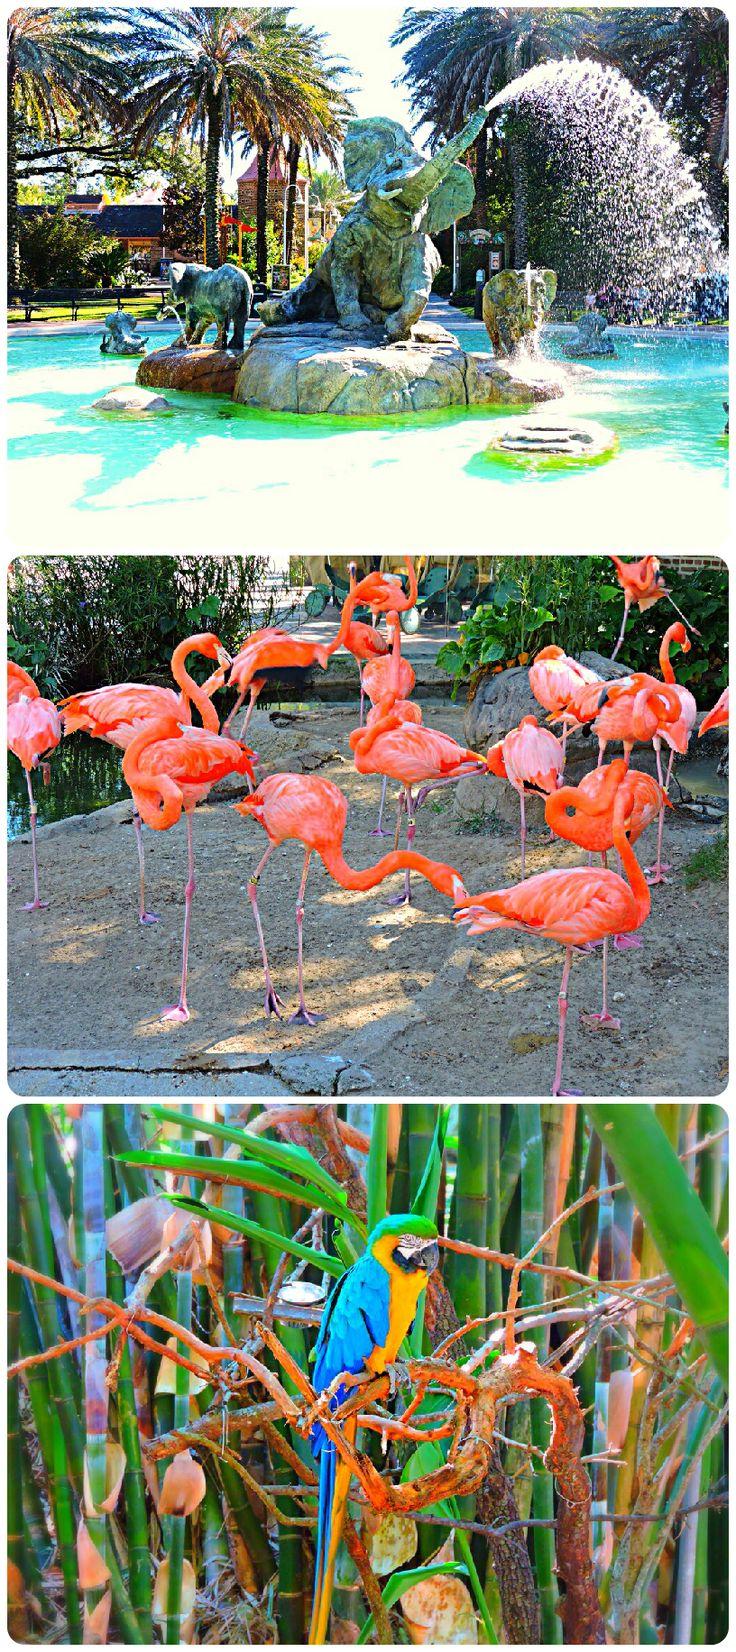 The Audubon Zoo in New Orleans, LA